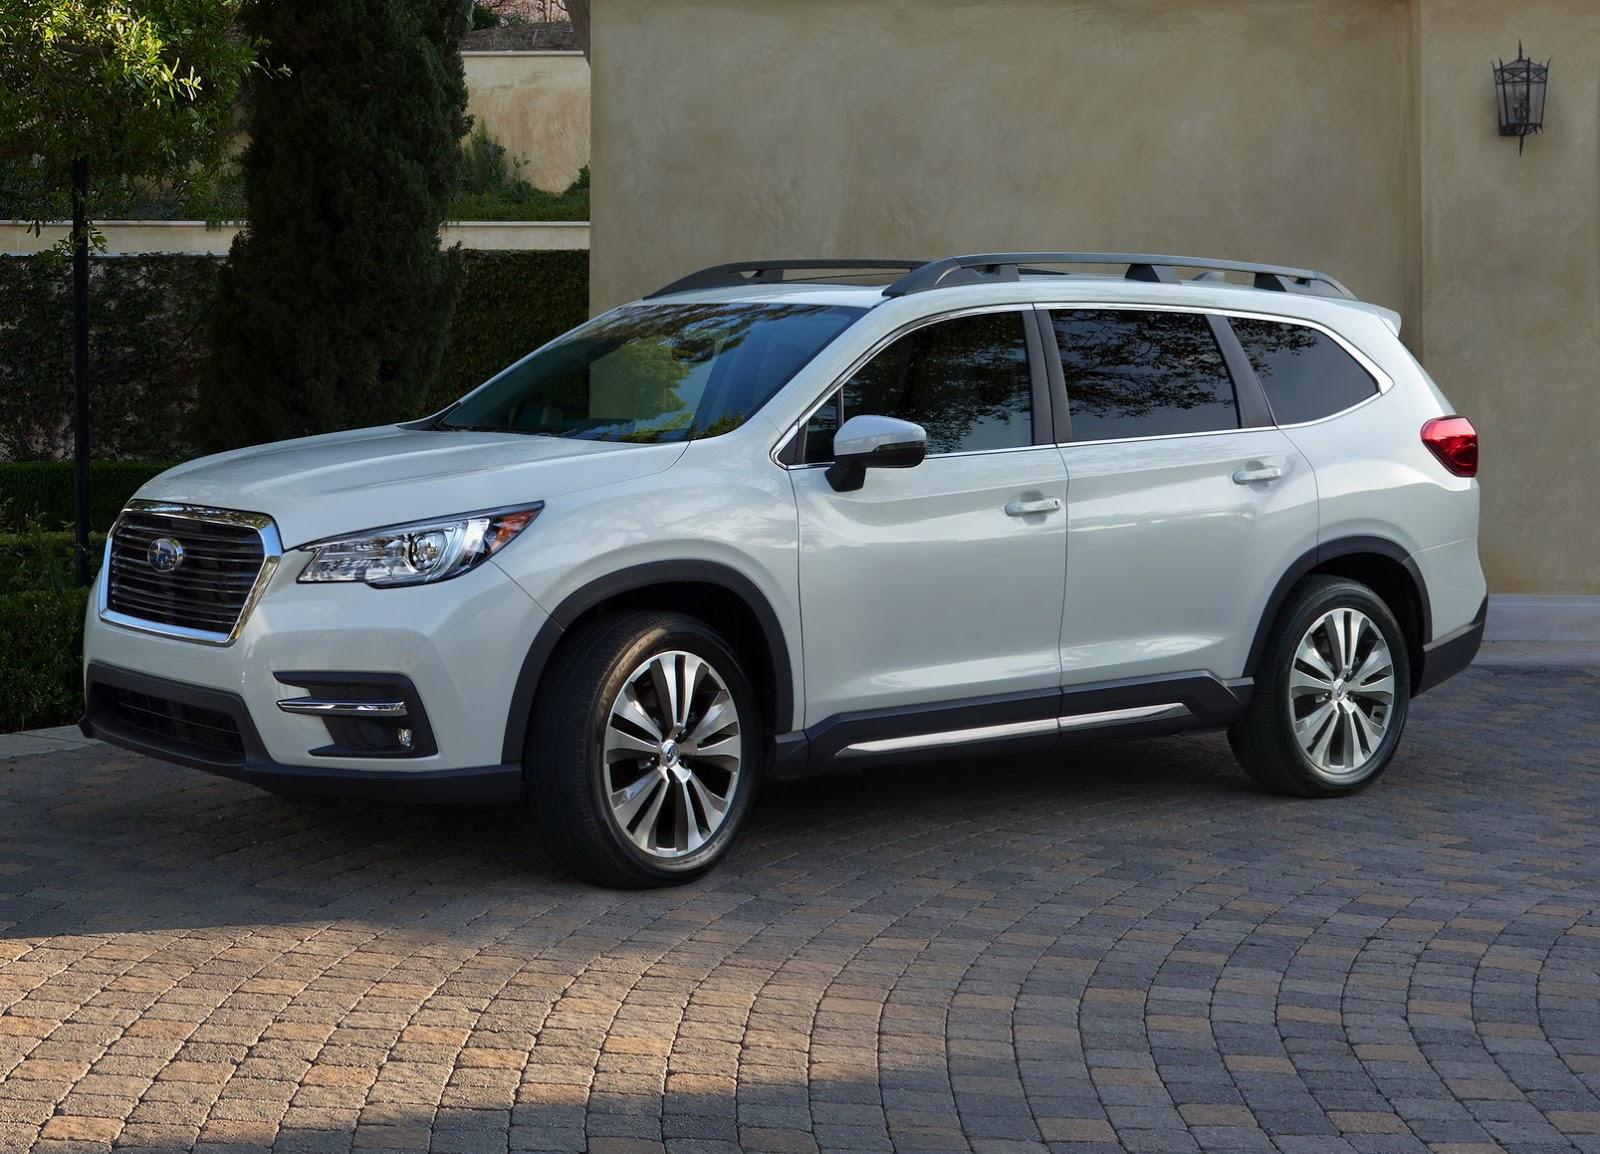 2019 Subaru Ascent Looks Like a Rival for the Honda Pilot ...